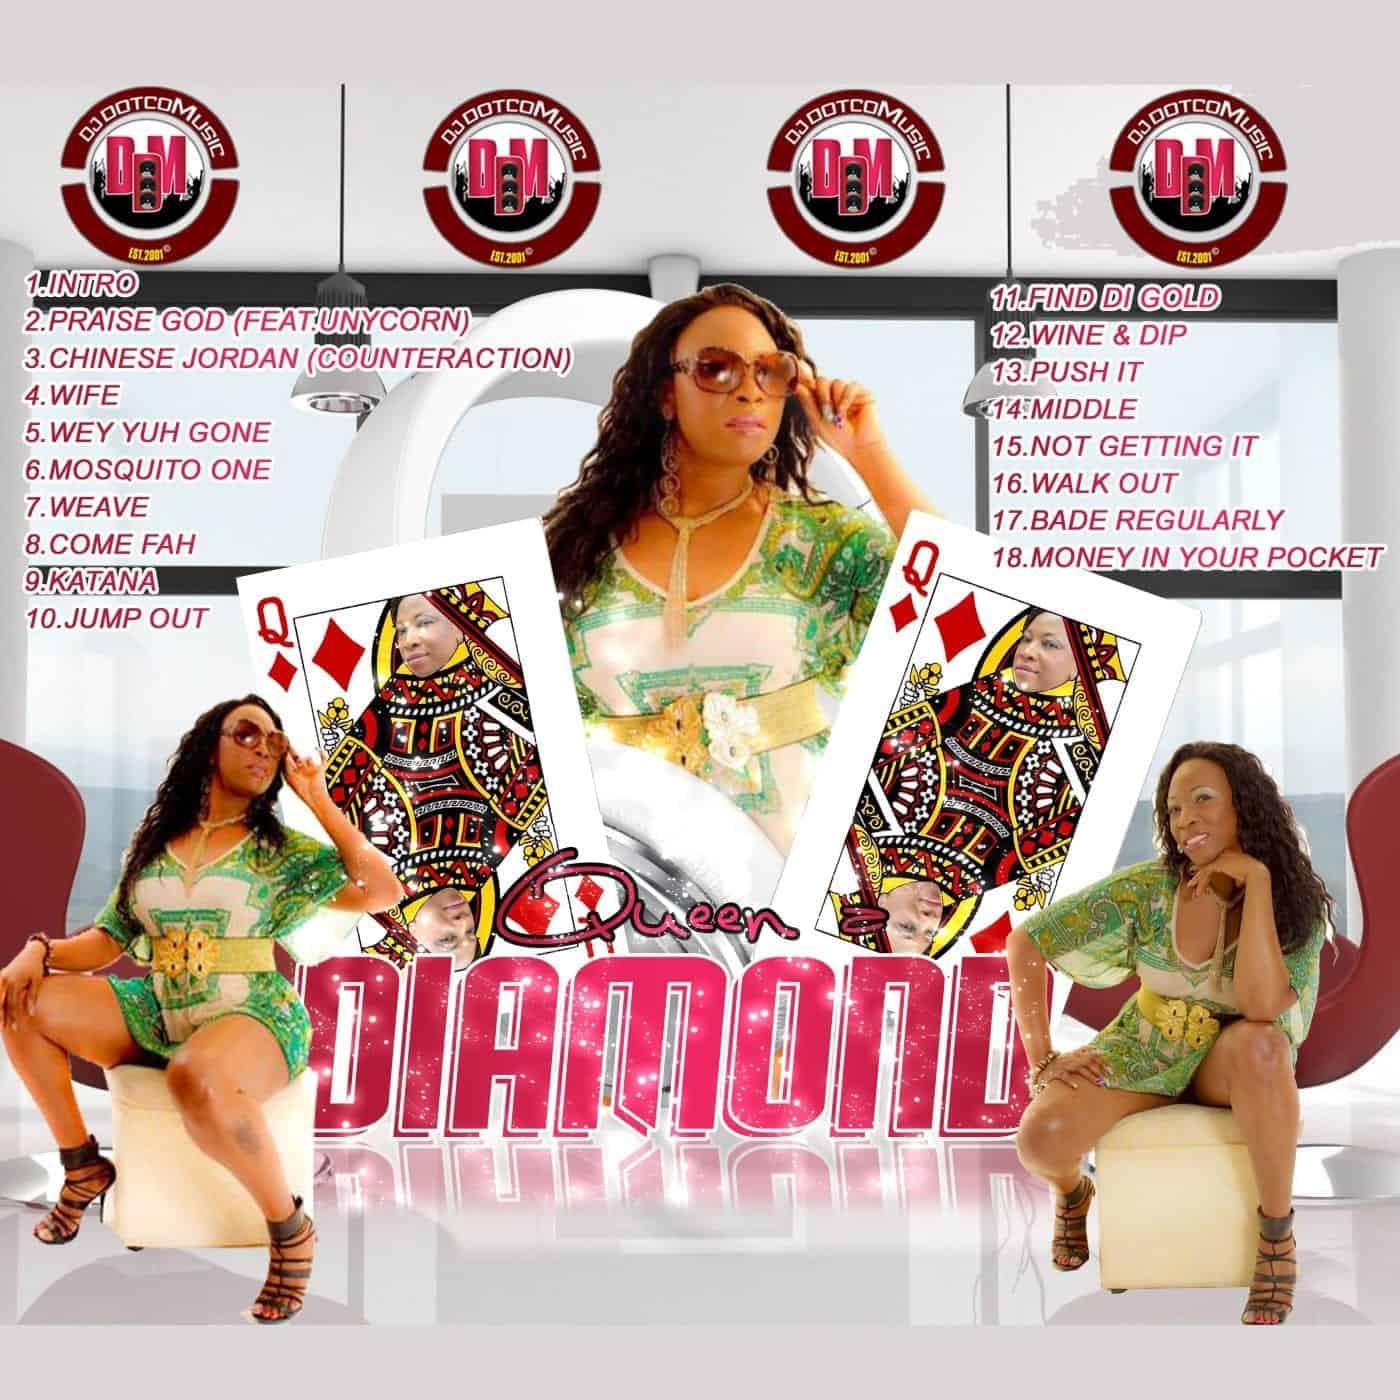 Dj DotCom Presents Macka Diamond Official Mixtape - Queen a Diamond